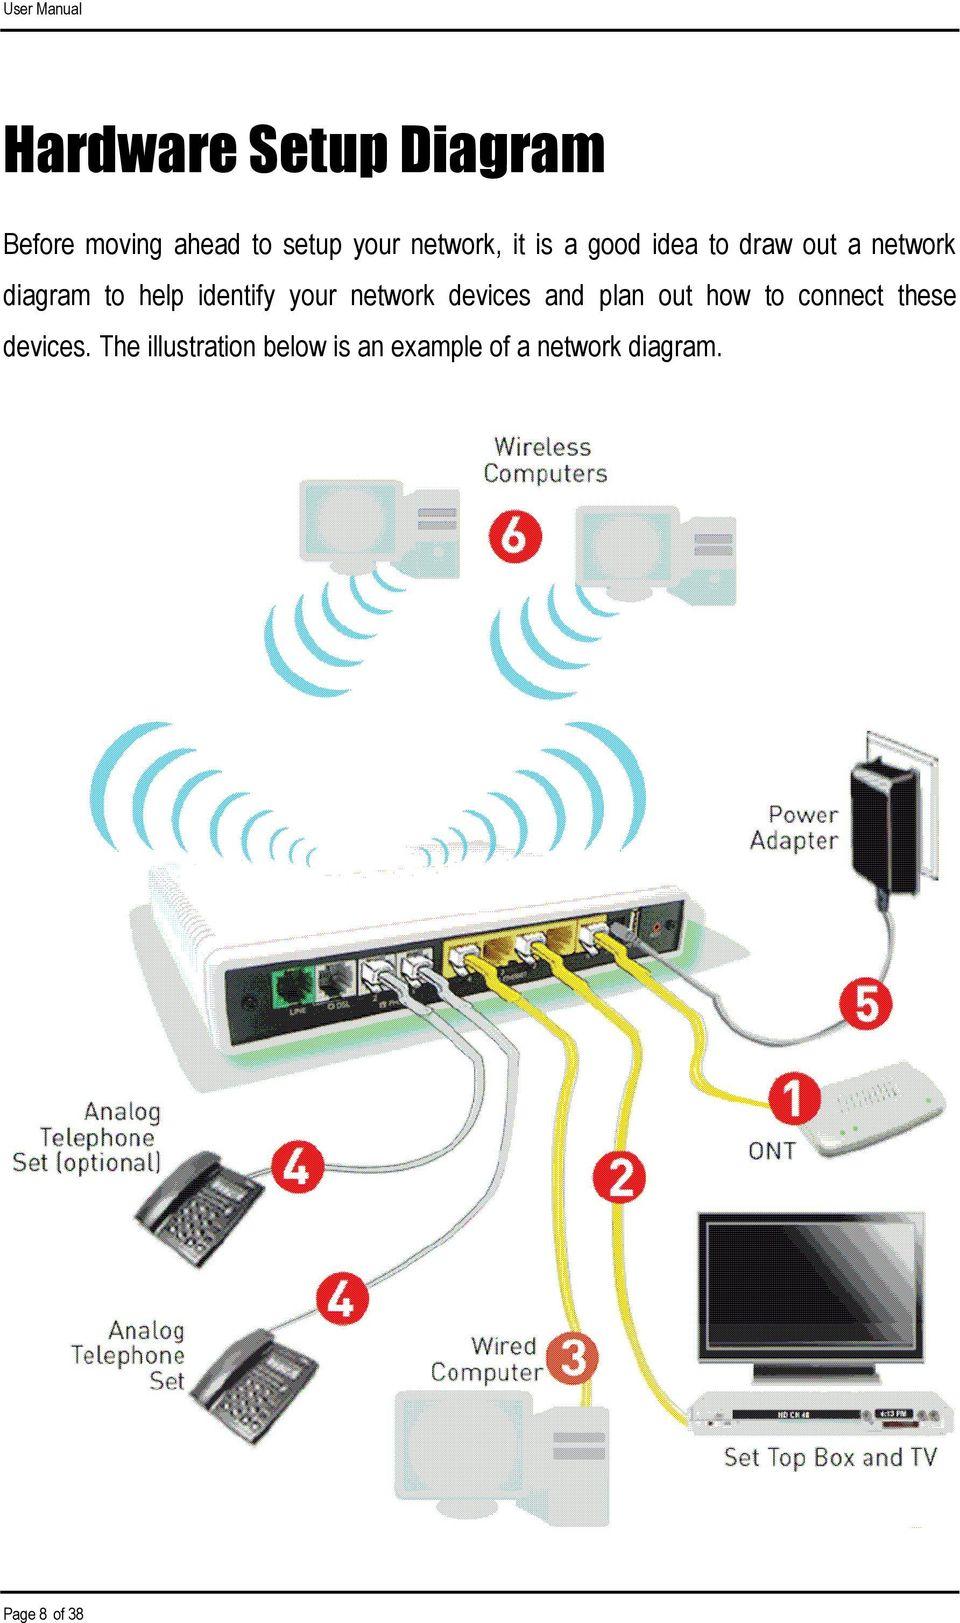 medium resolution of ethernet port 2 iptv set top box 3 ethernet port 4 wired pc 4